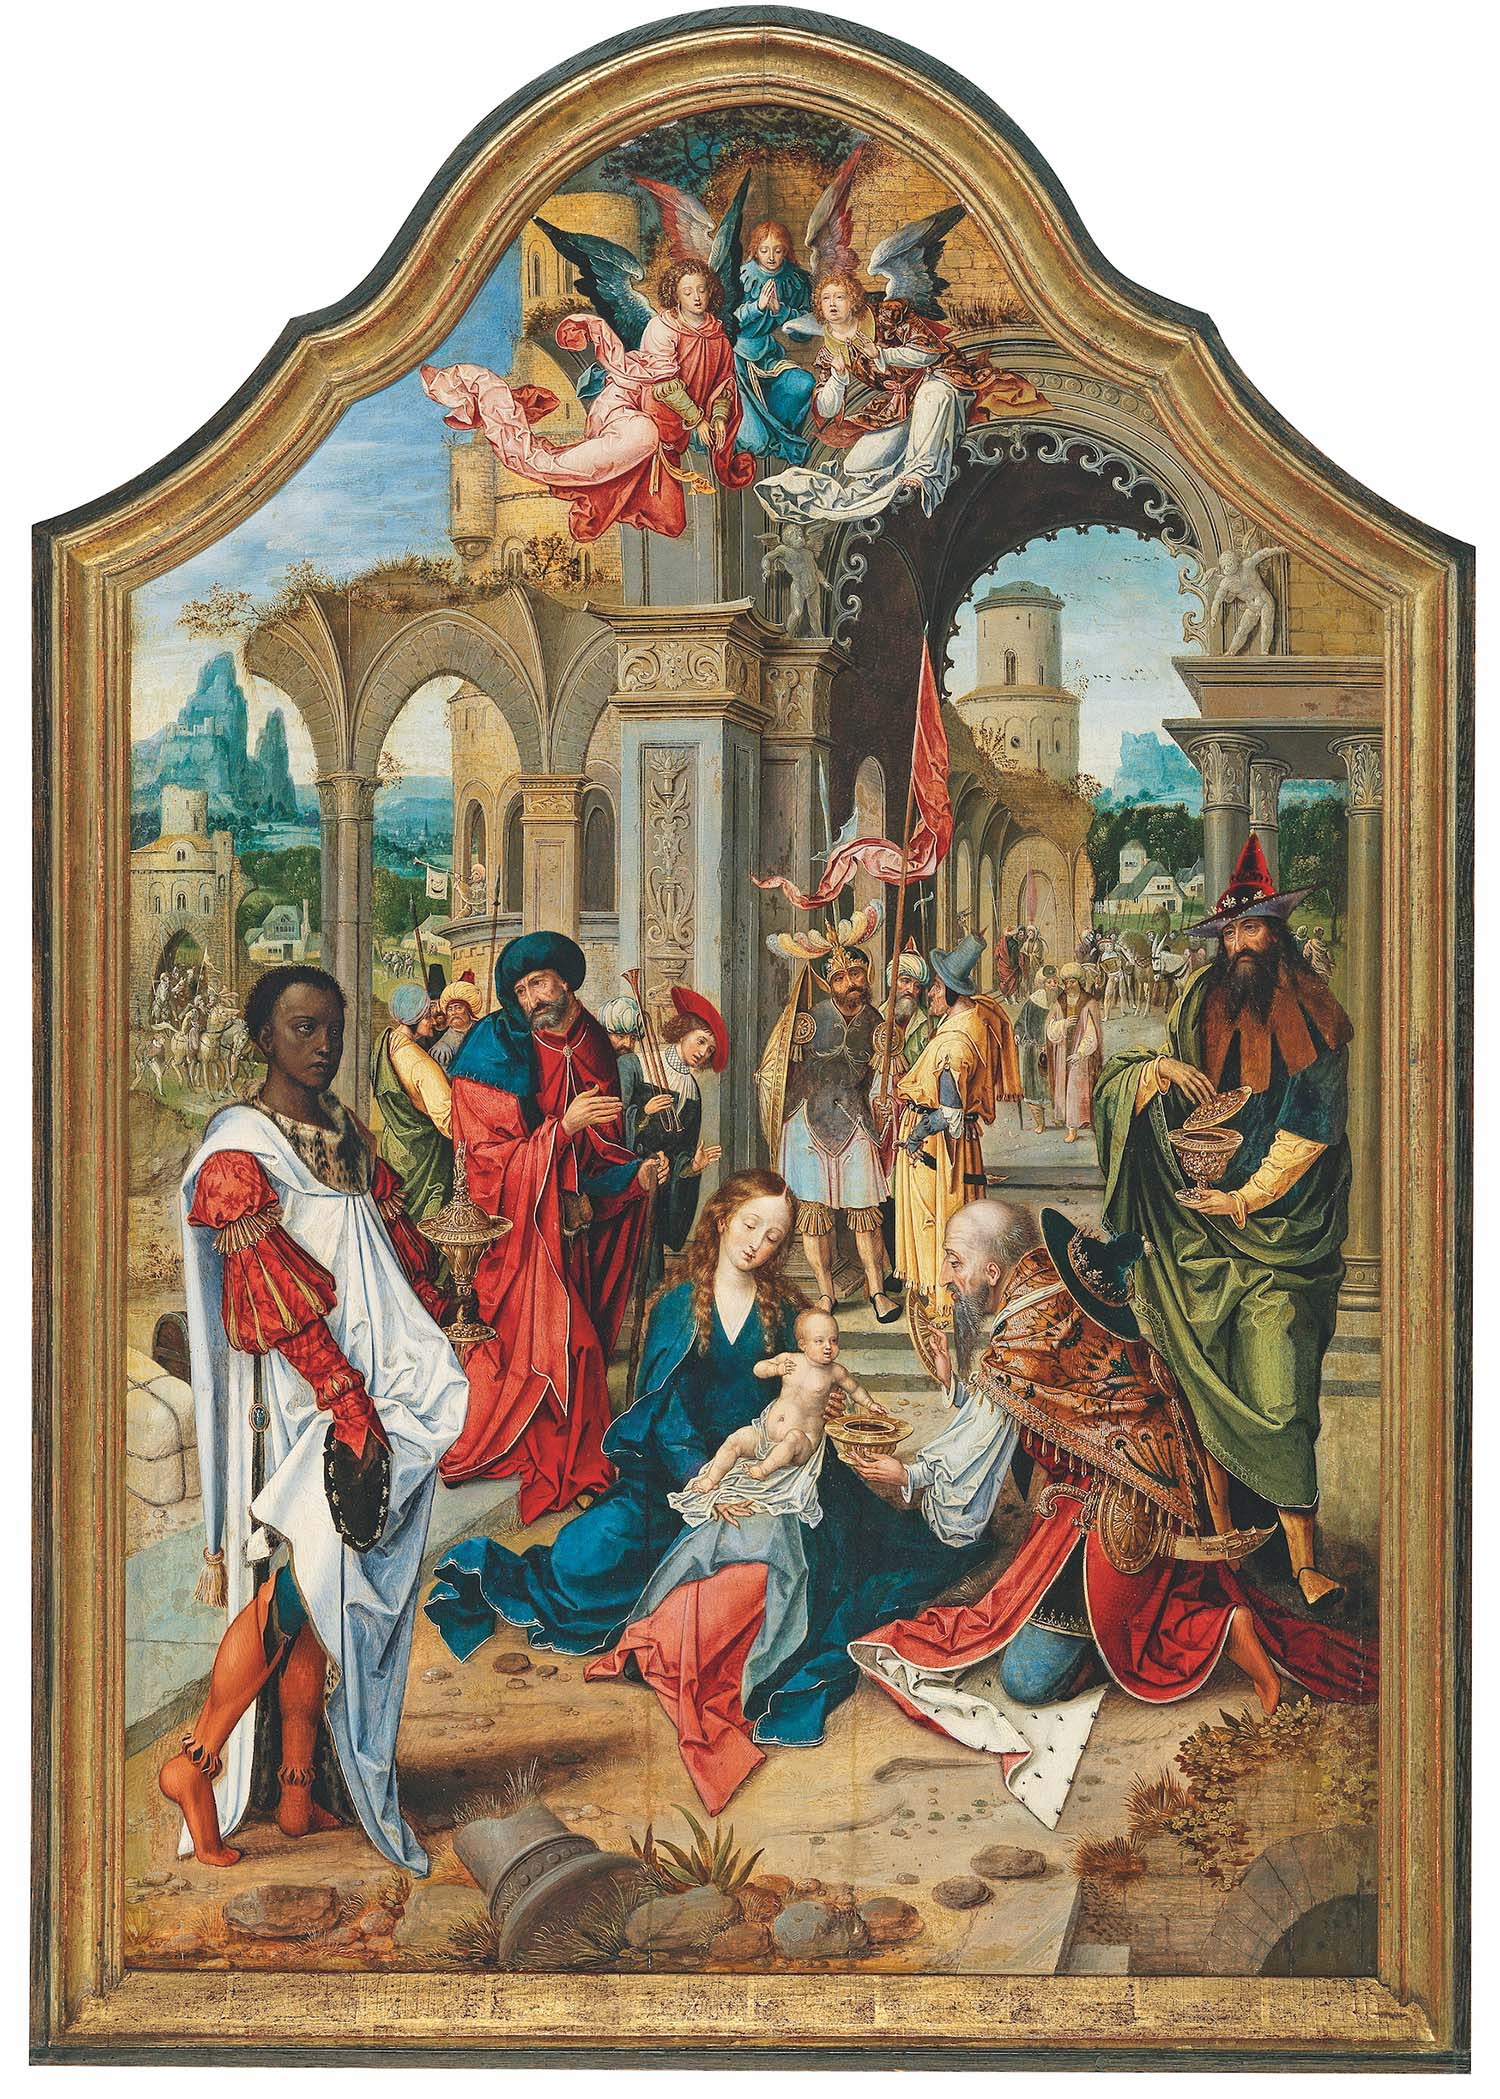 Pieter Coecke van Aelst (1502–1550), Adoration of the Magi, oil on panel, 112 x 75 cm, estimate €400,000 – 600,000